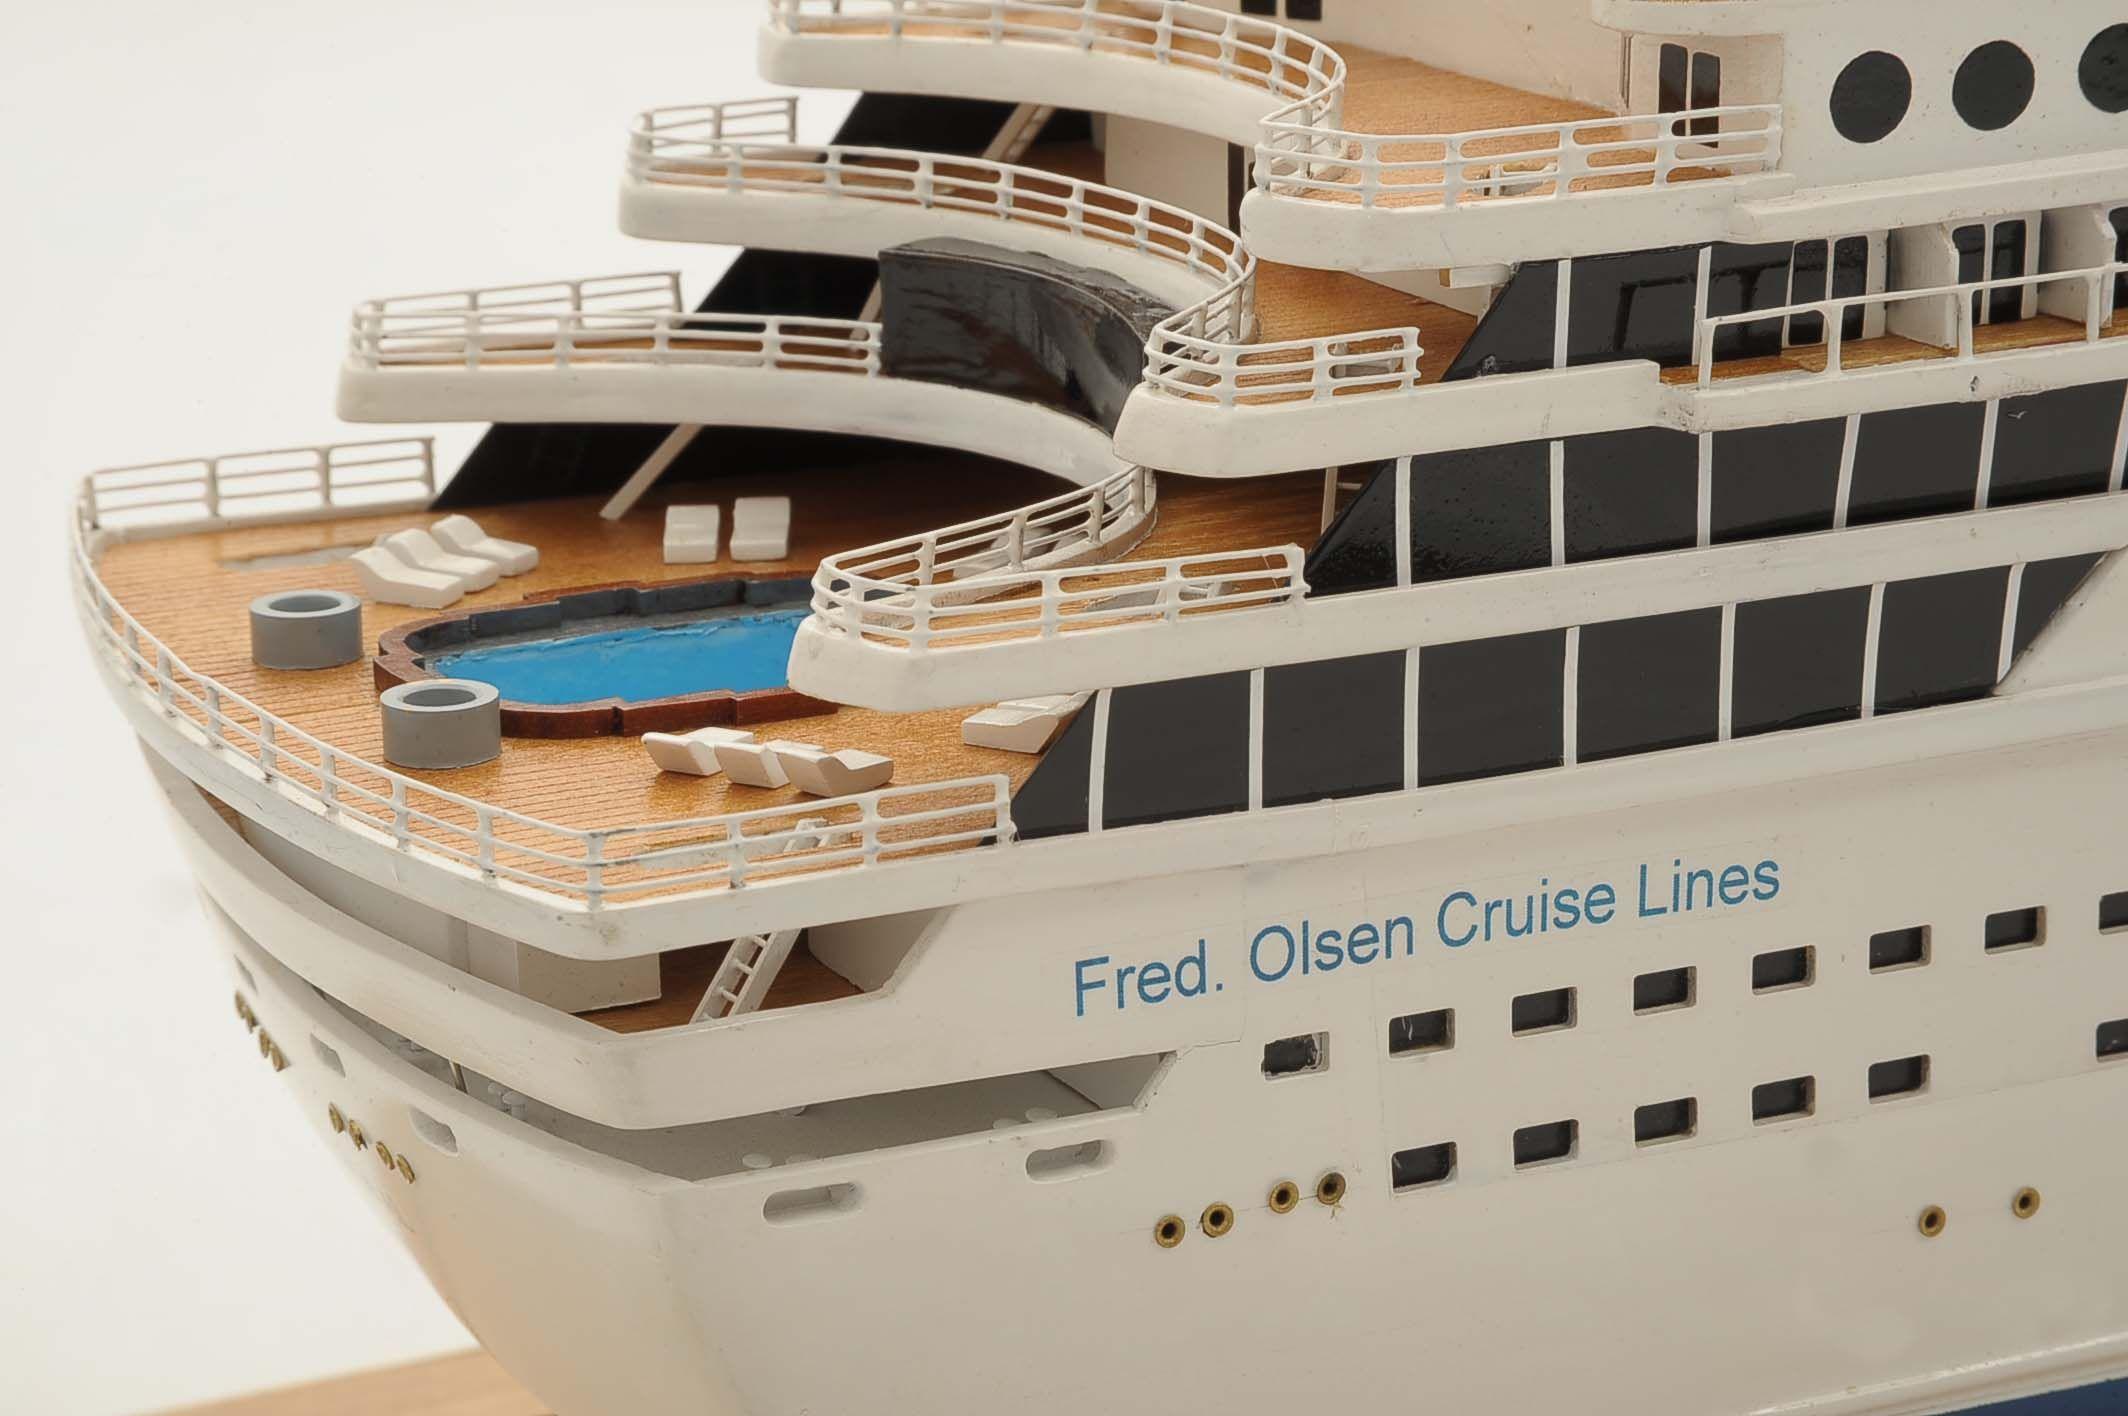 1292-6417-Balmoral-Cruise-Liner